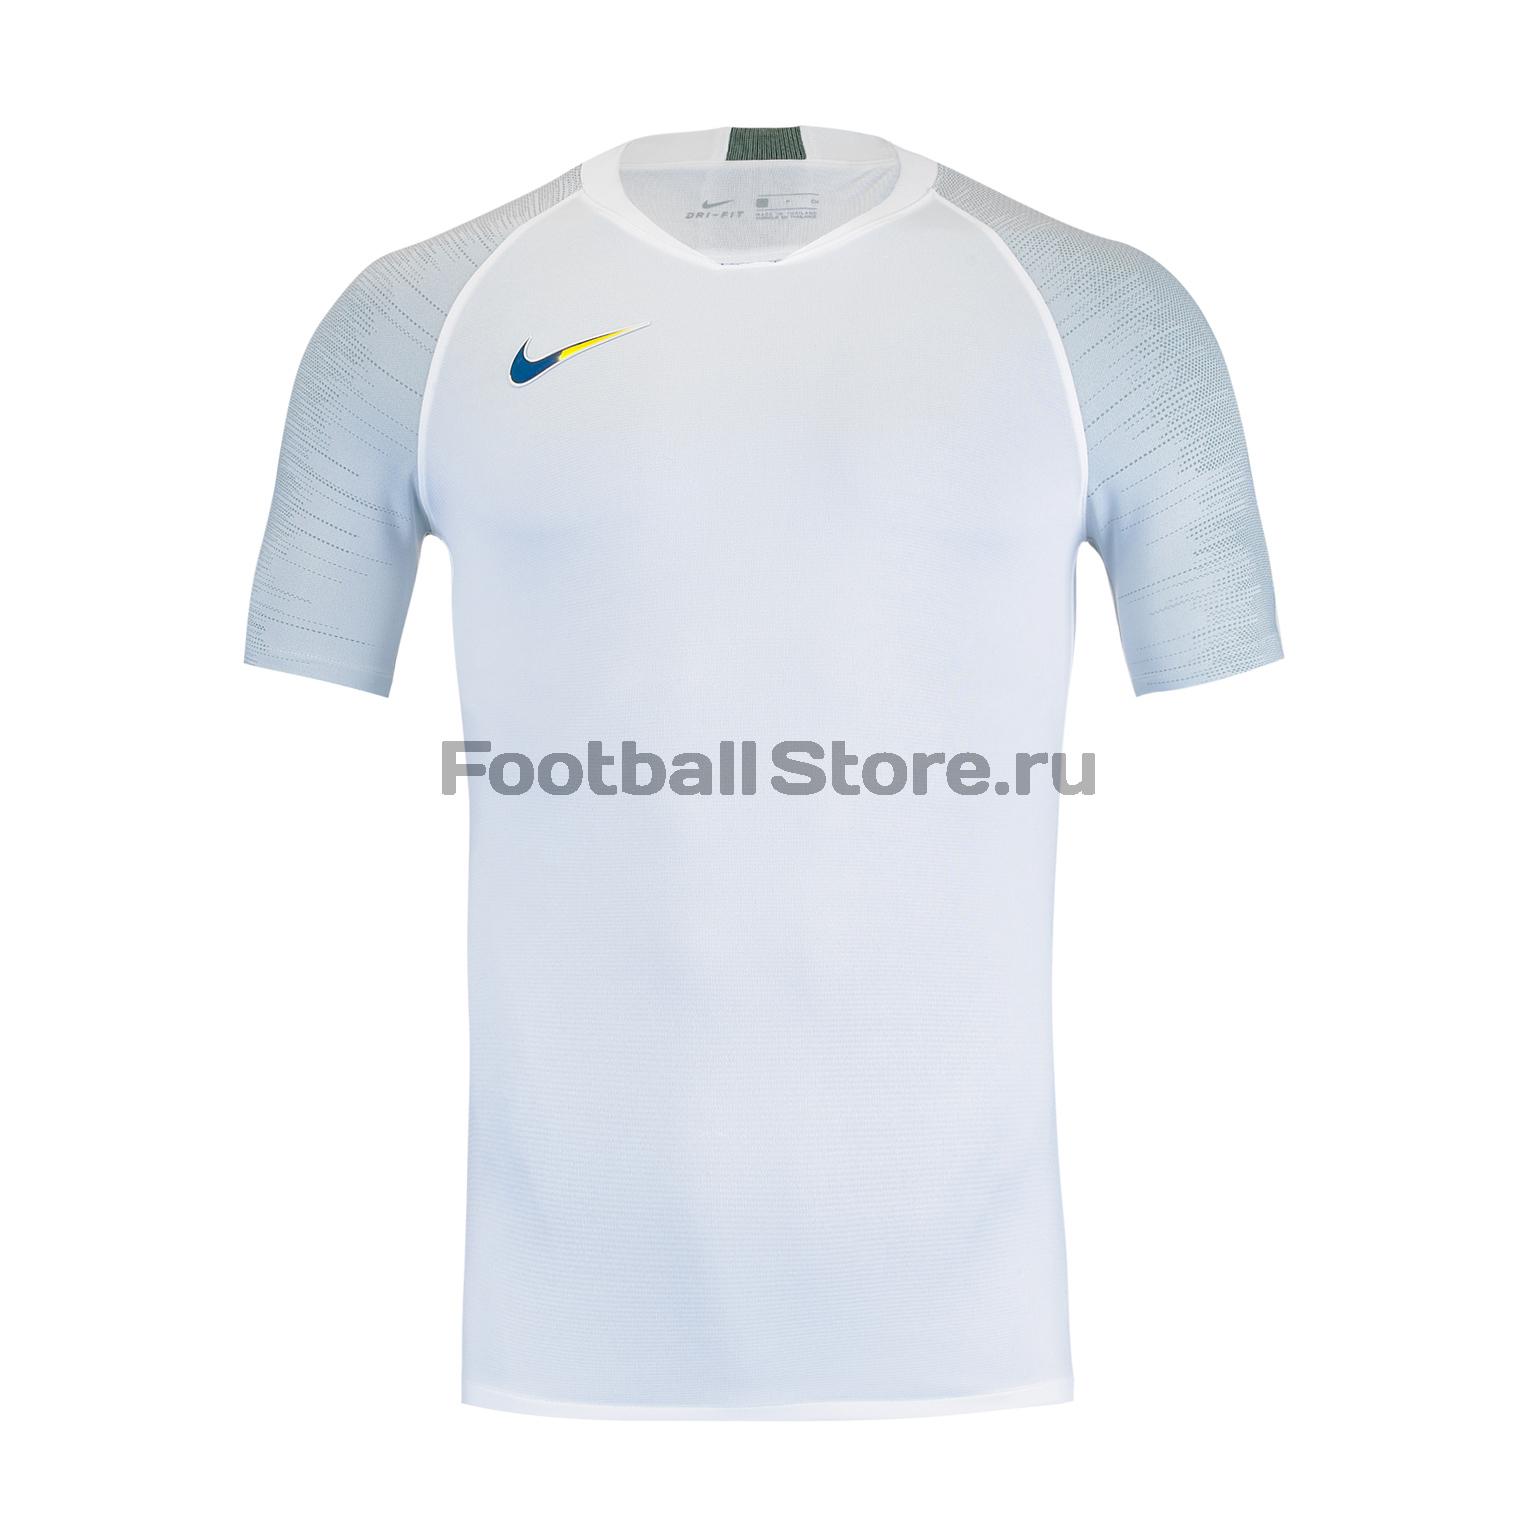 Футболка тренировочная Nike Strike Top AT5870-100 цена